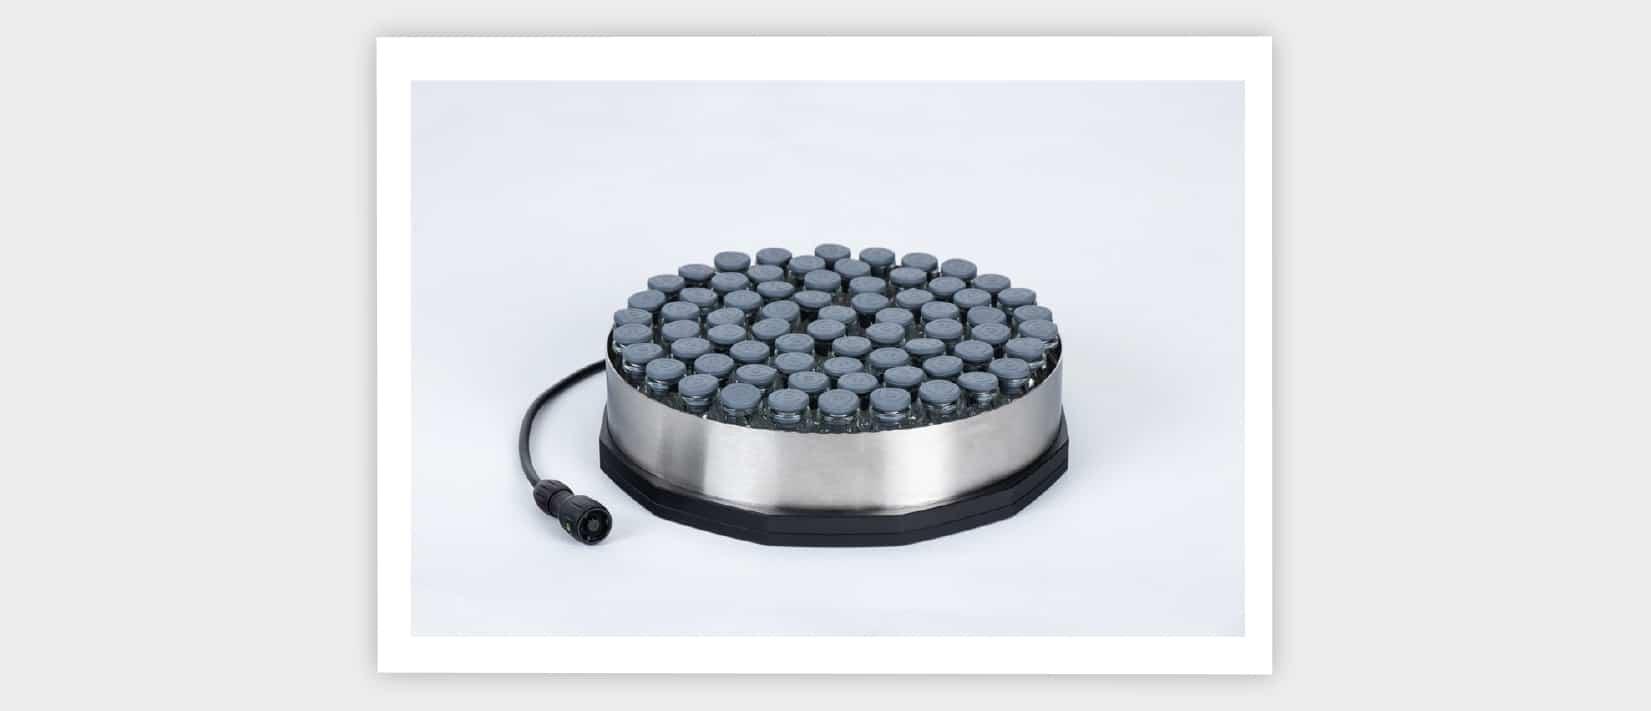 ferrule, metallic ring, edge vial, edge vial effect, freeze drying, lyophilization, freeze dryer